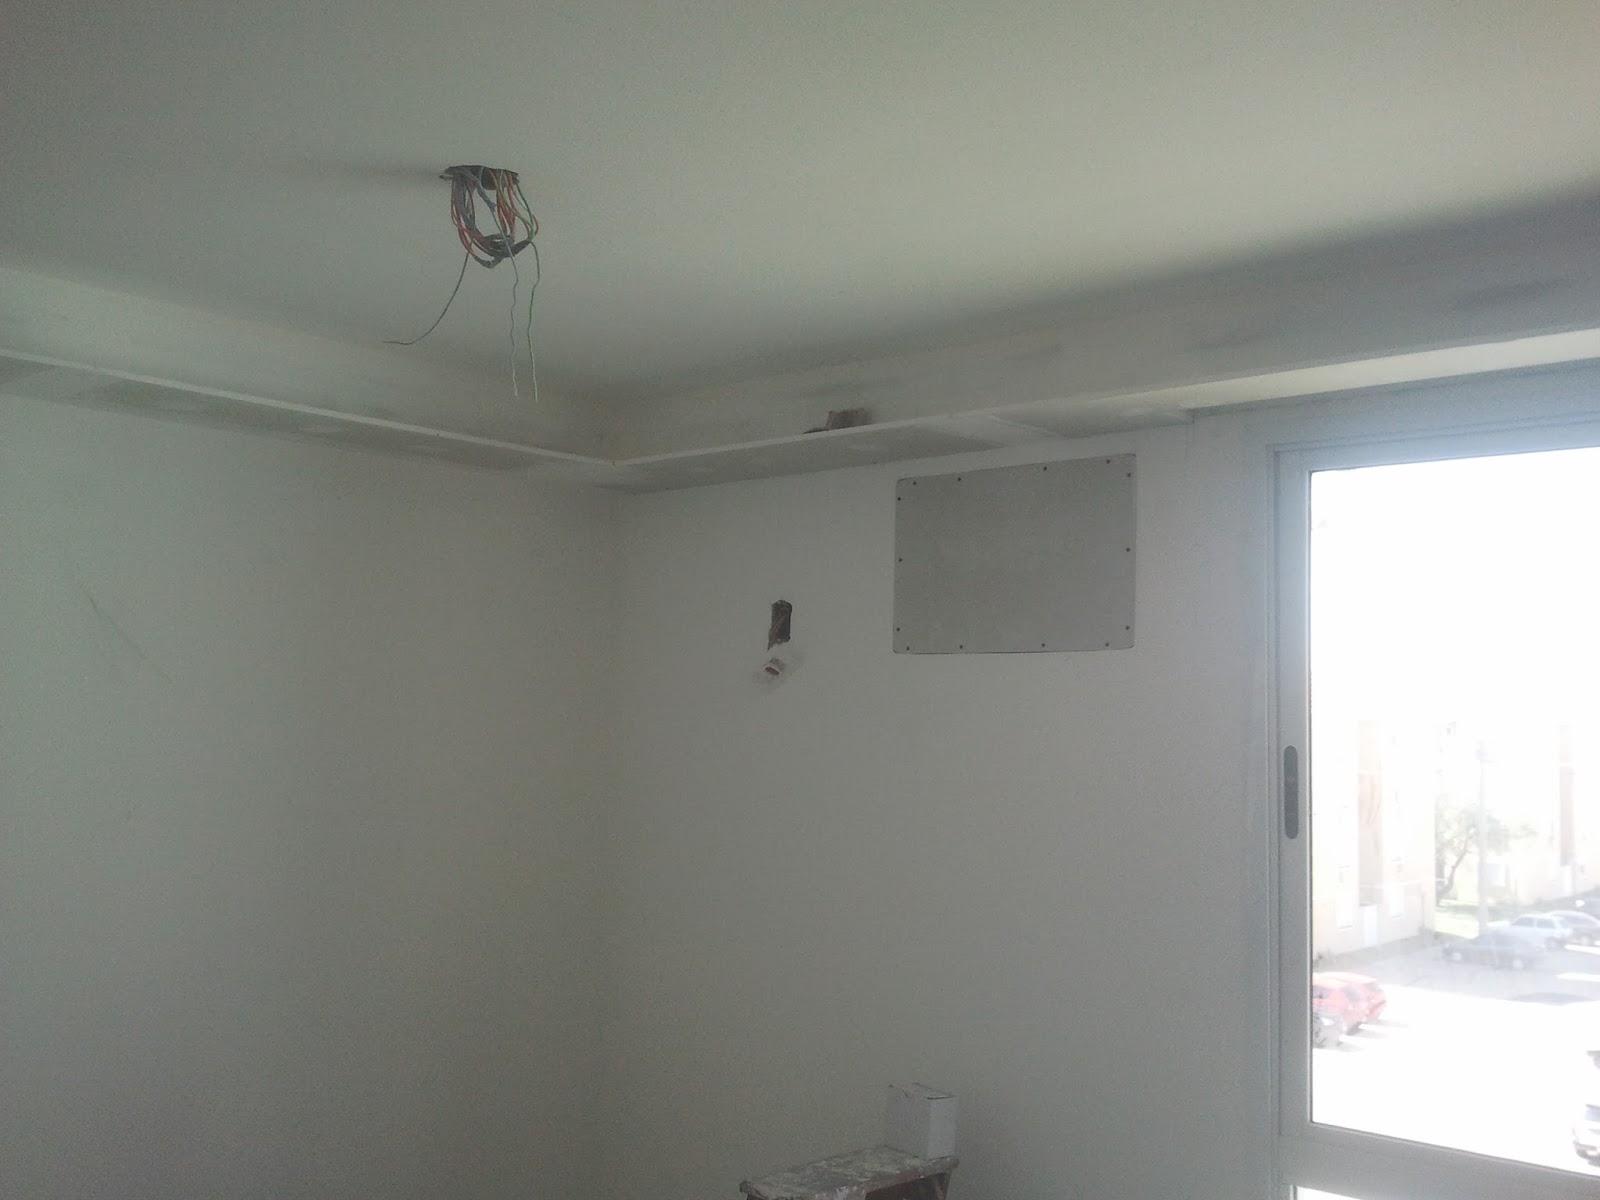 #556777 Casei quero casa: Fechando o buraco do ar condicionado. 4212 Instalar Ar Condicionado Janela Apartamento